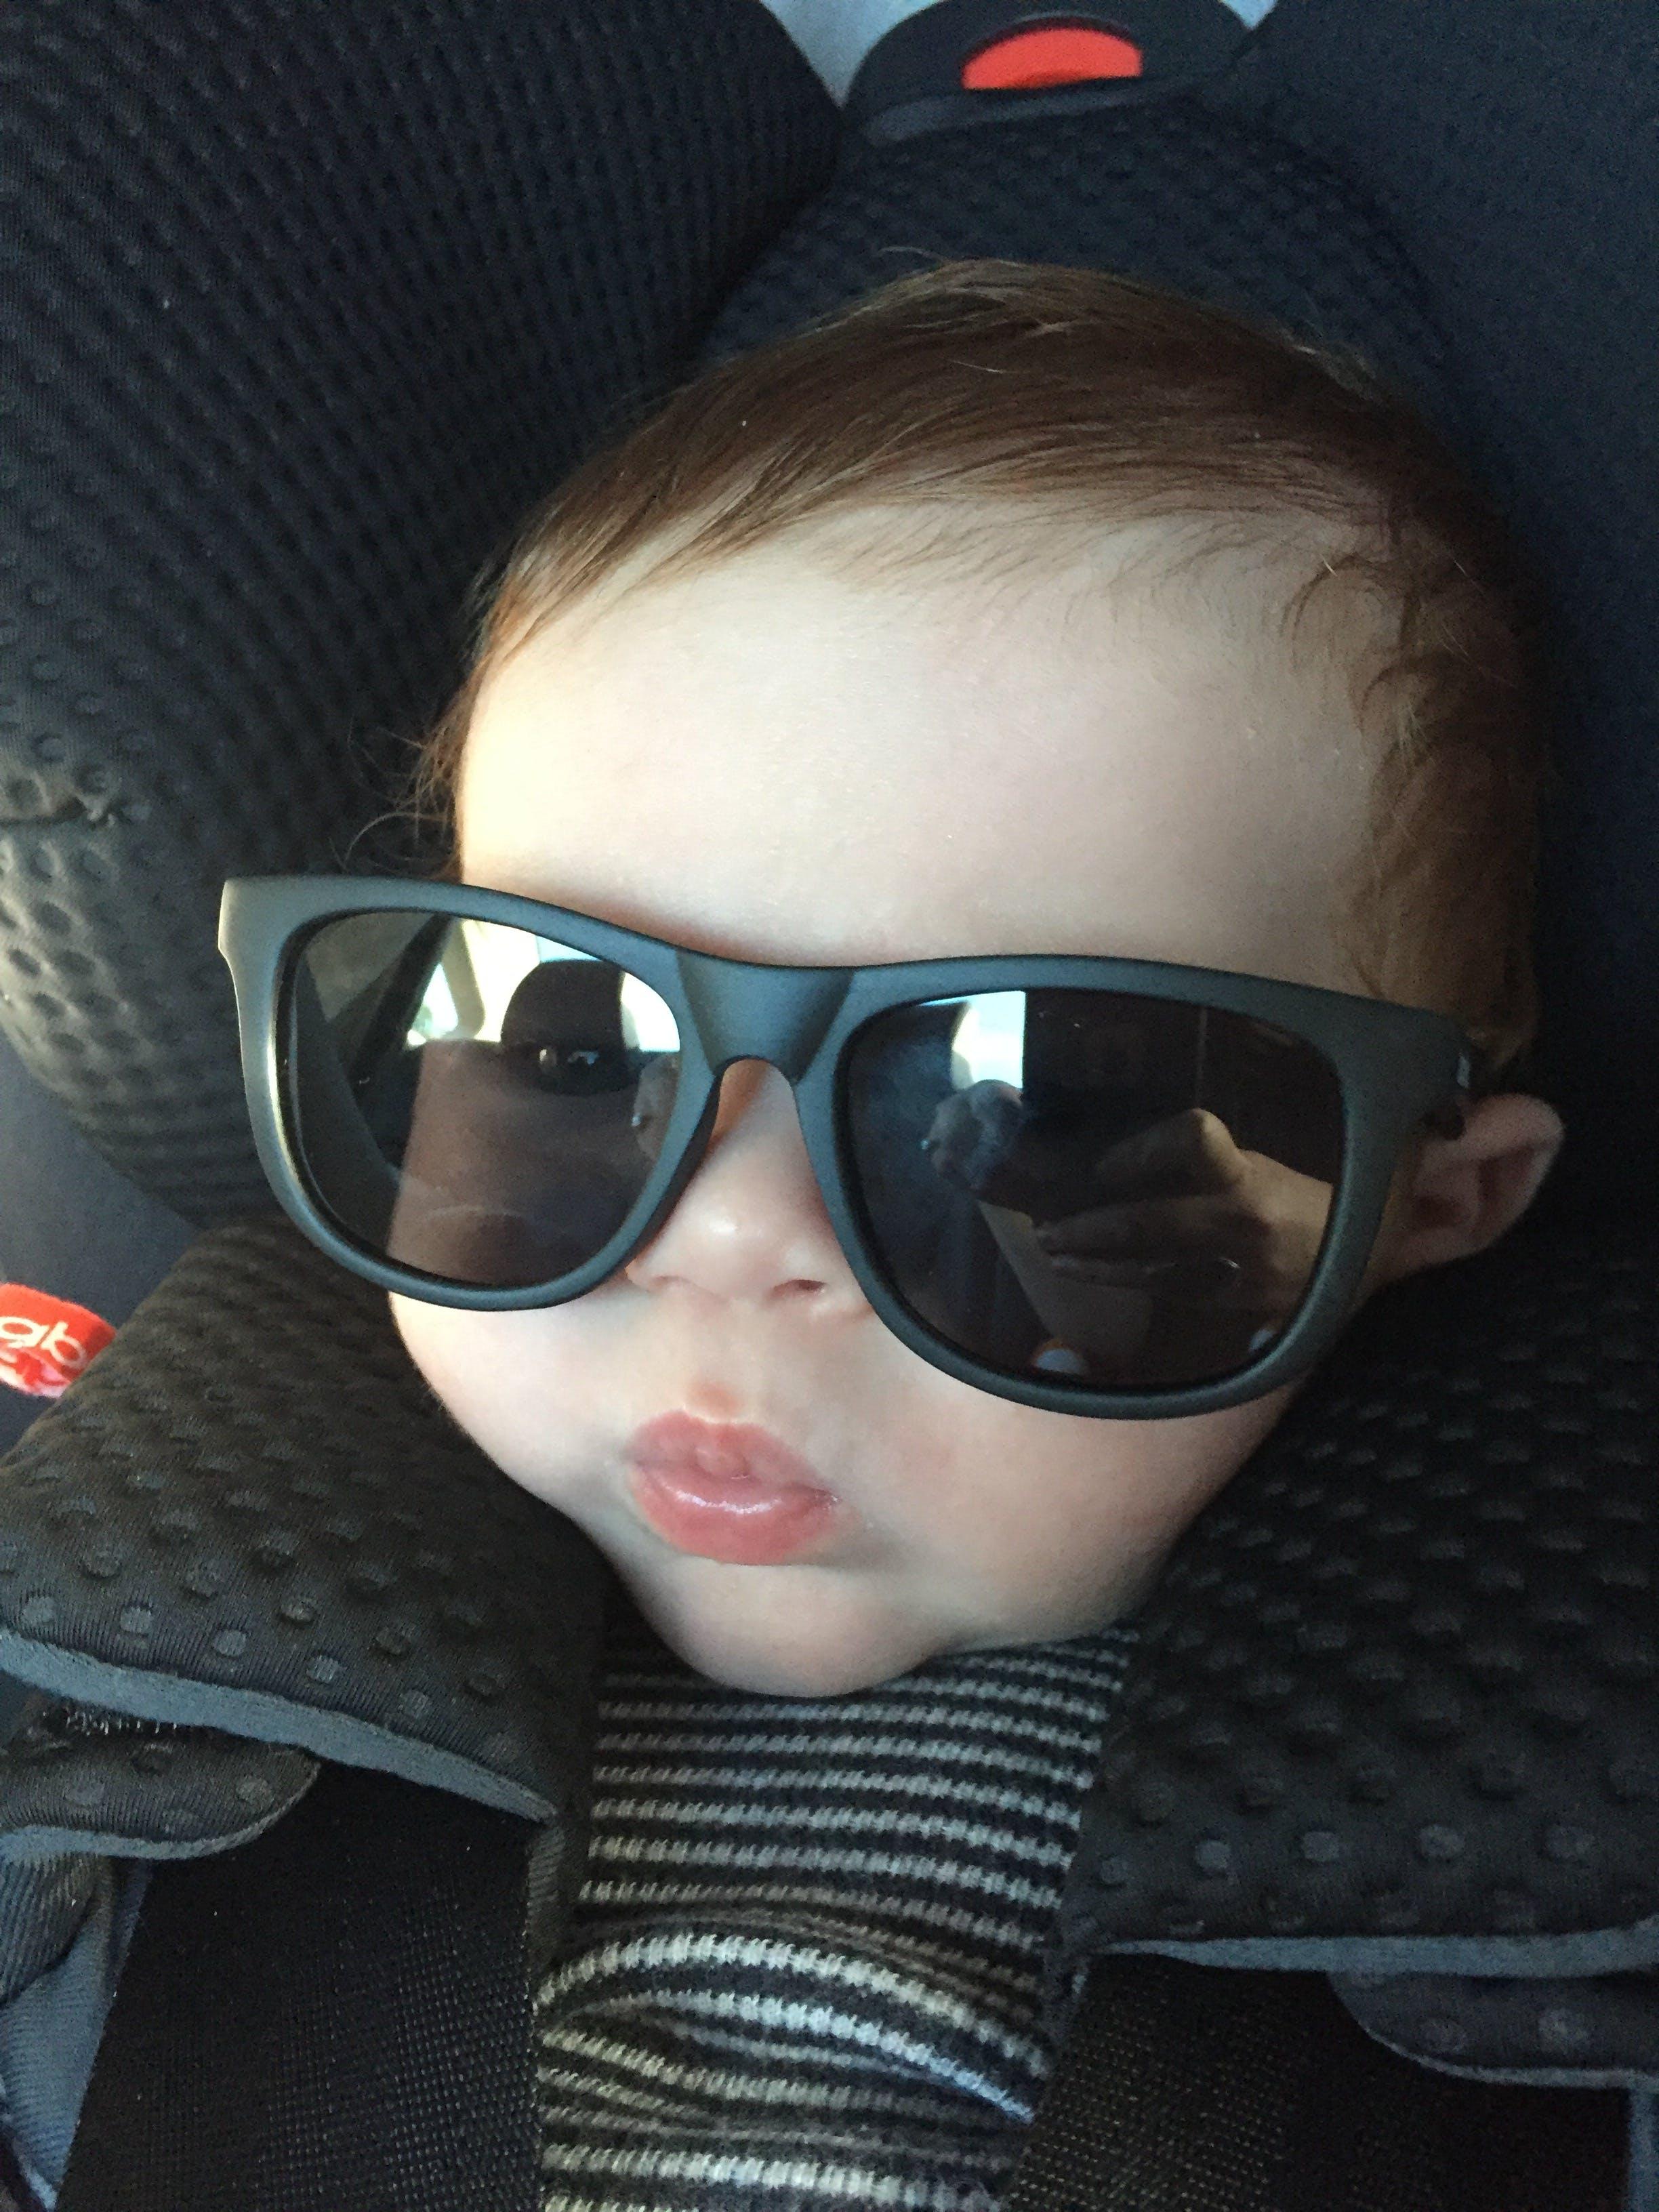 Baby Sunglasses - Black Polarized | Baby Sunglasses by